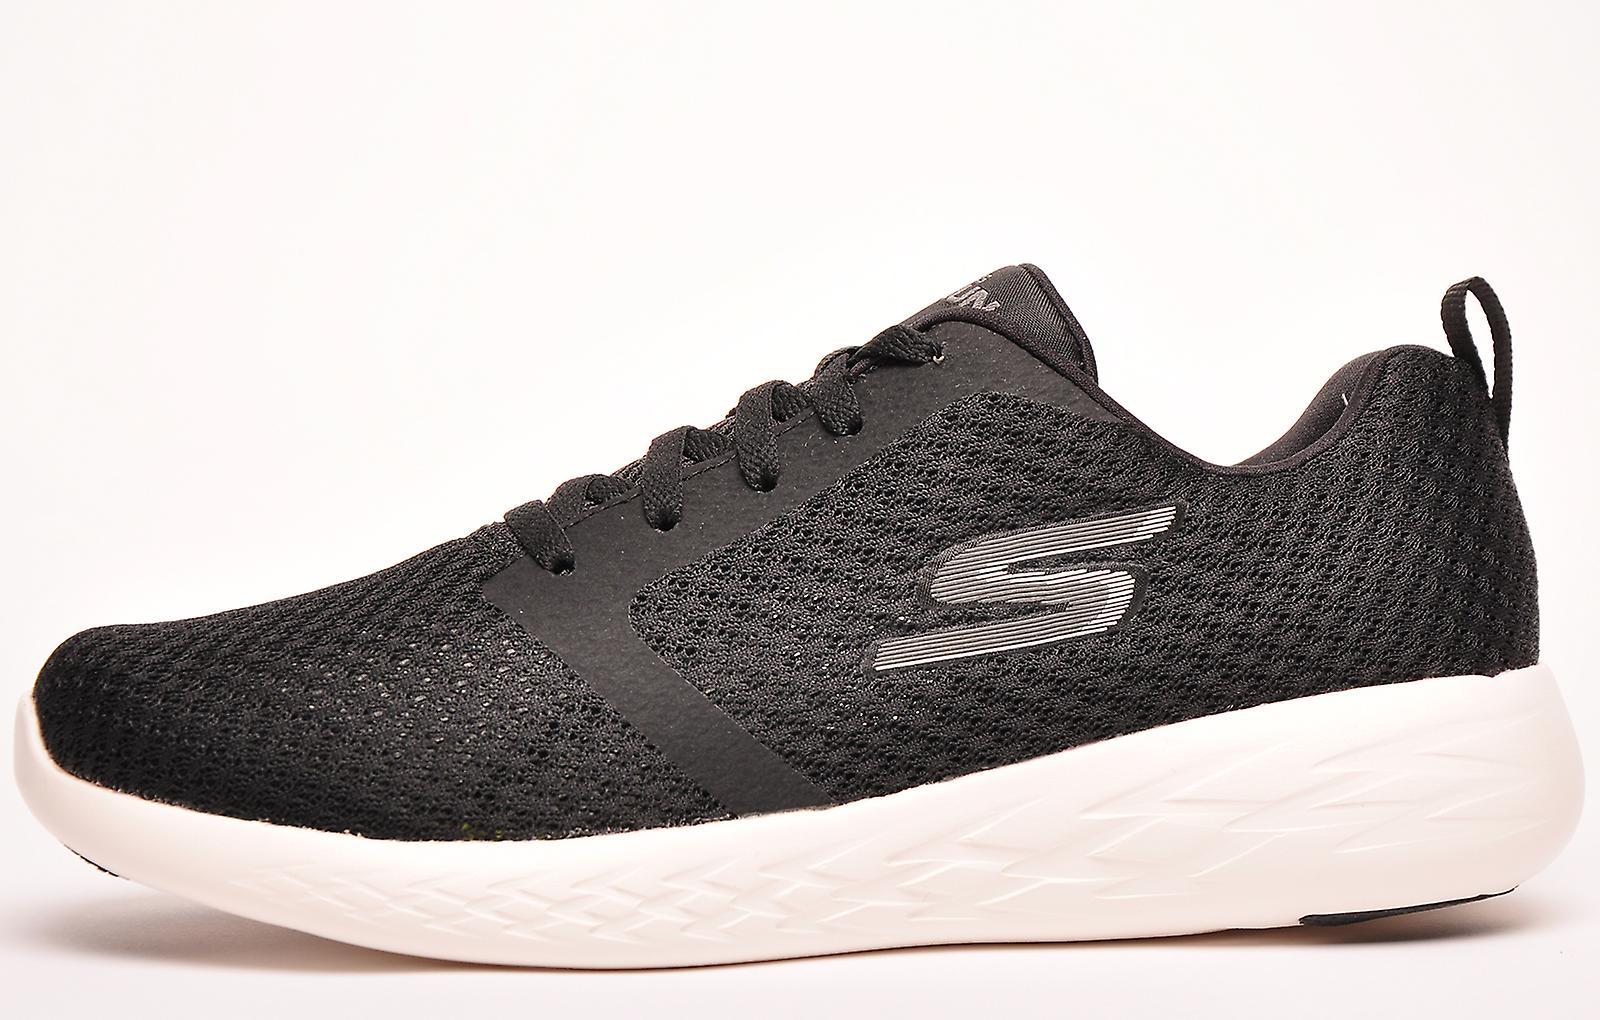 Skechers Go Run 600 Comfort Foam New Black / White